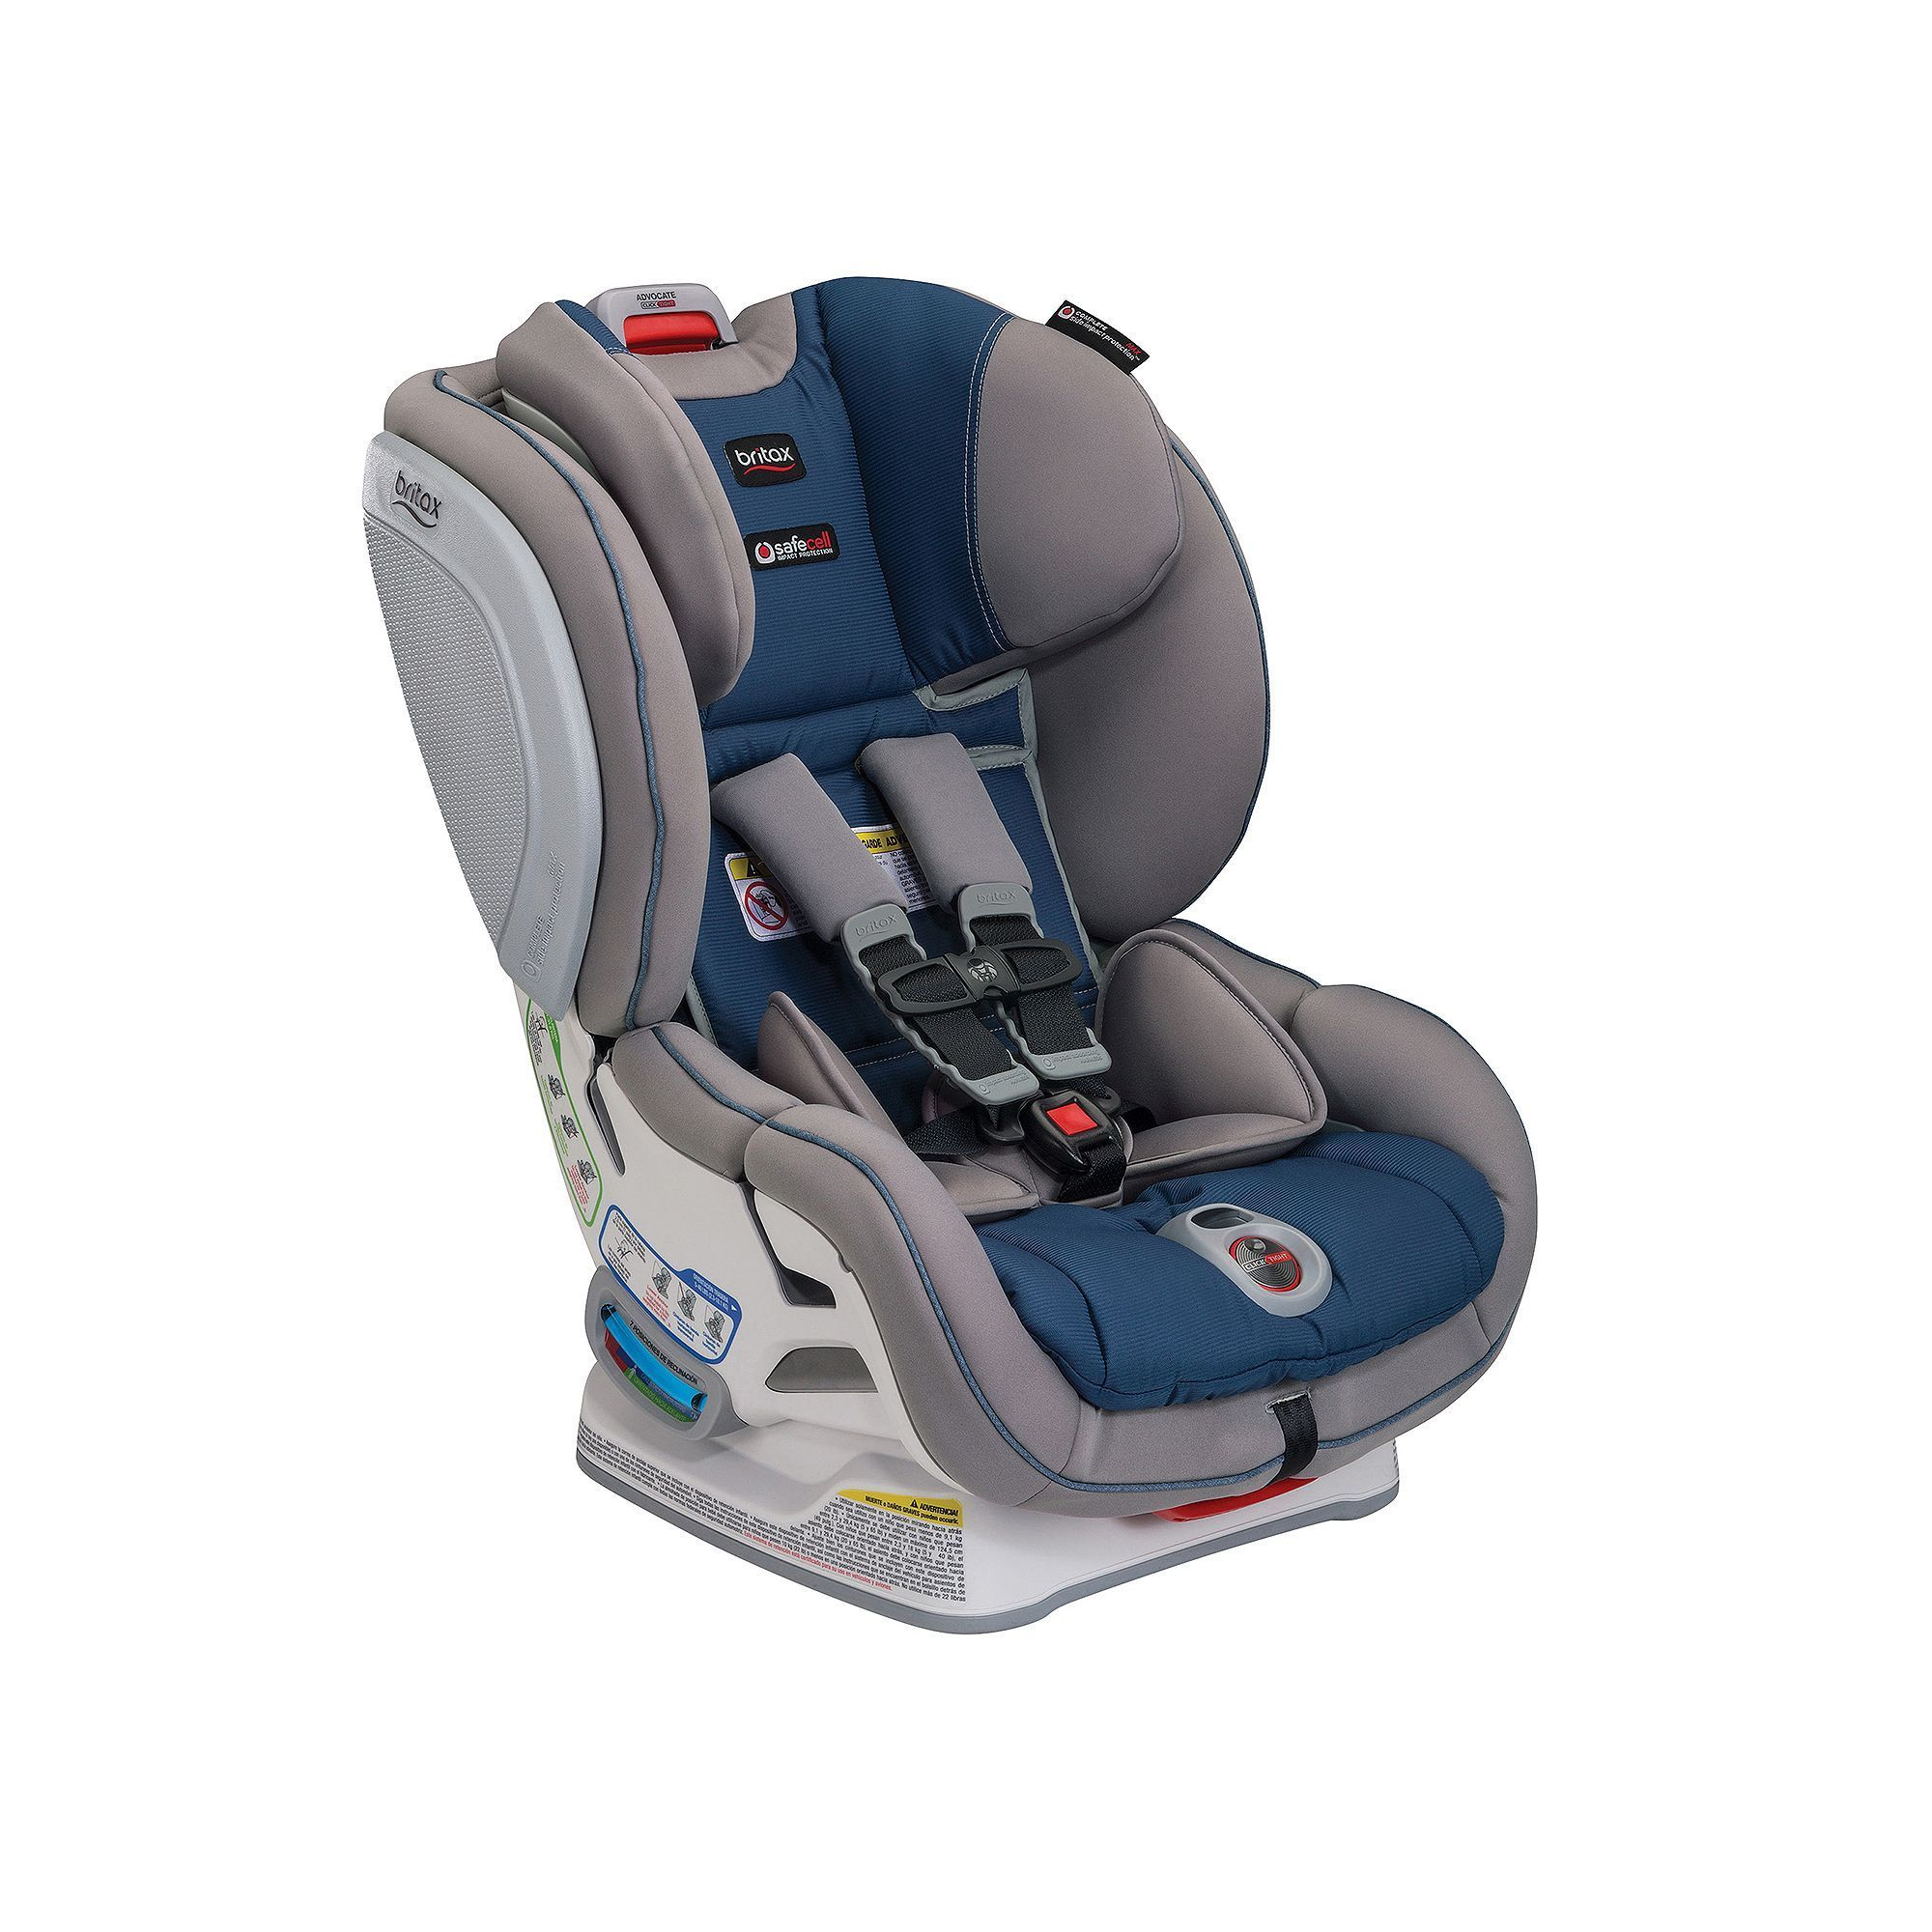 Britax Advocate ClickTight Convertible Car Seat Multicolor